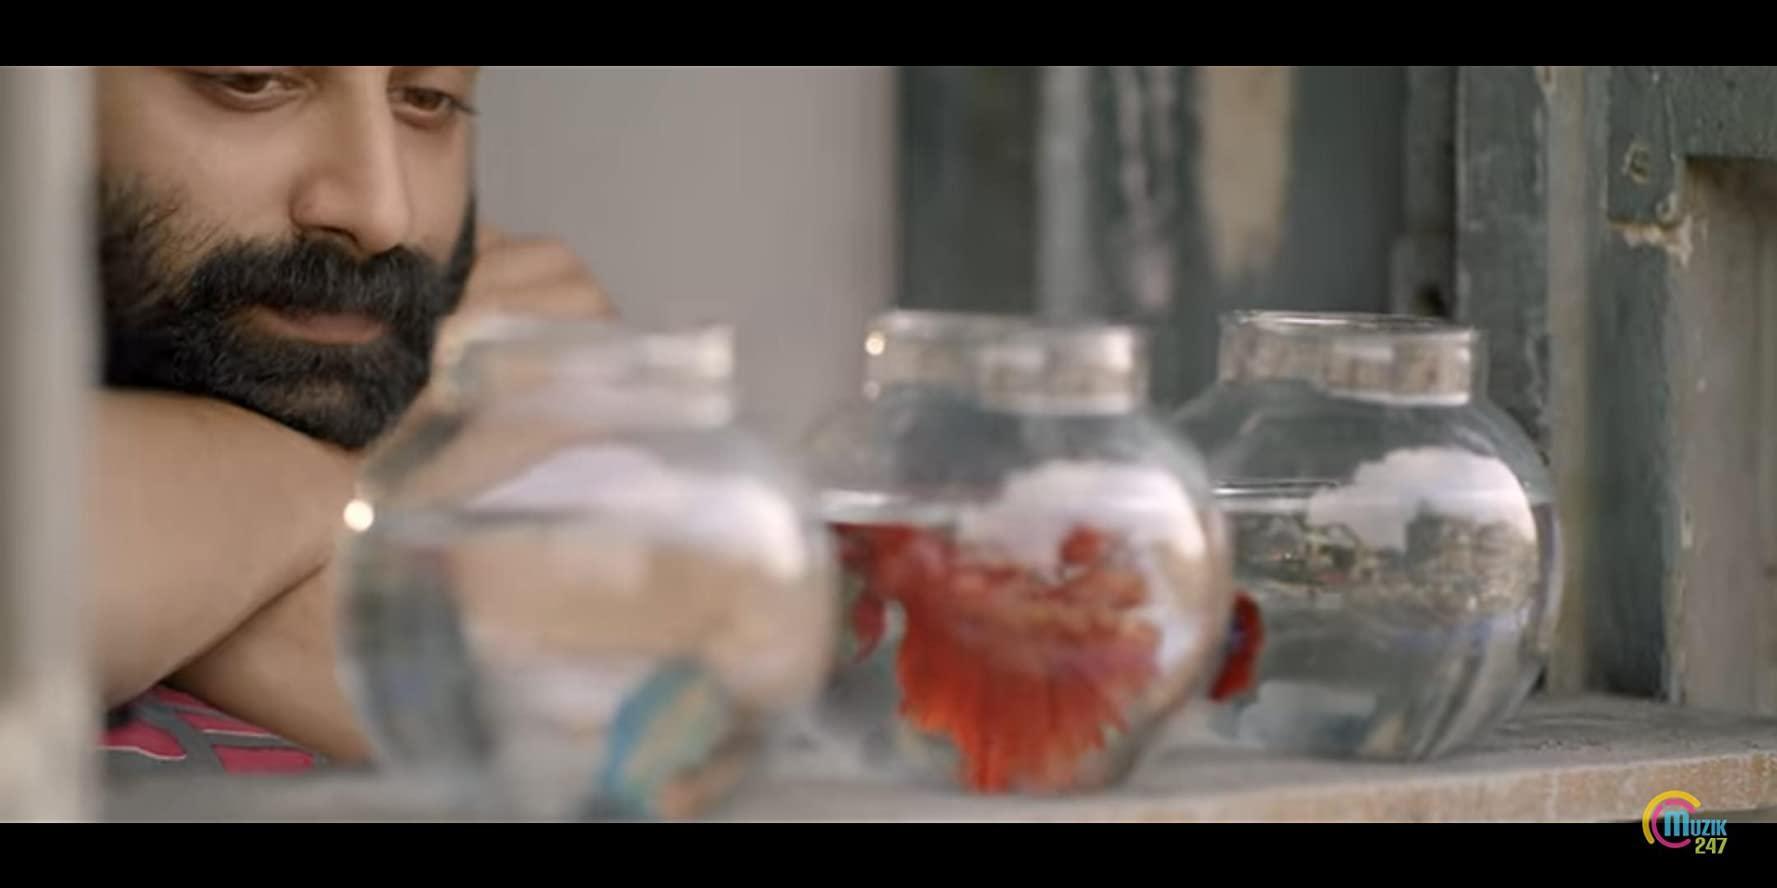 مشاهدة فيلم Trance (2020) مترجم HD اون لاين